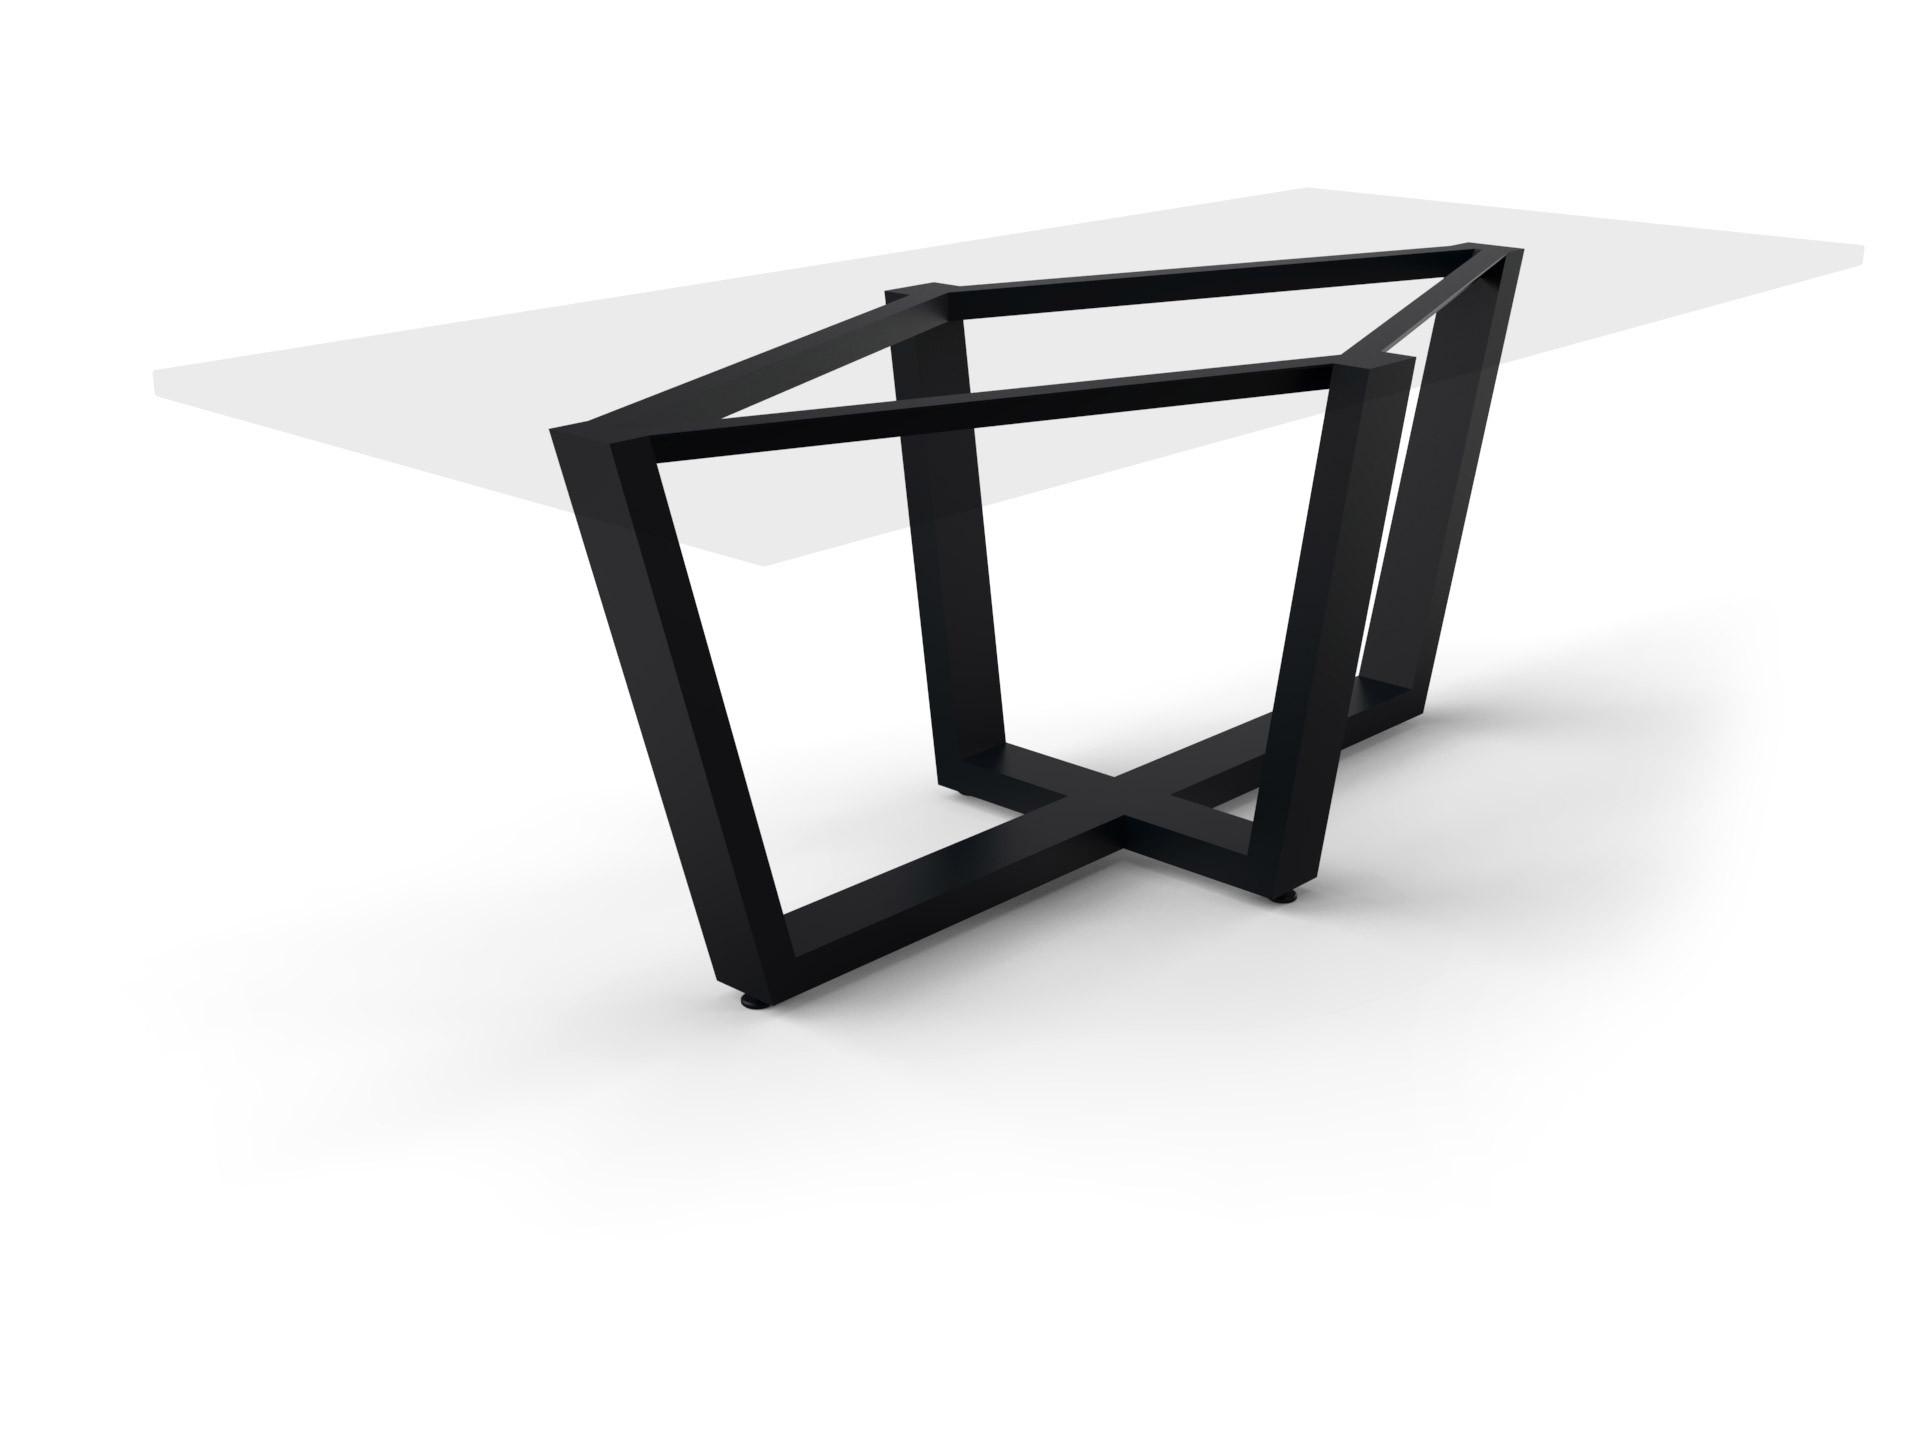 Tischgestell Milano